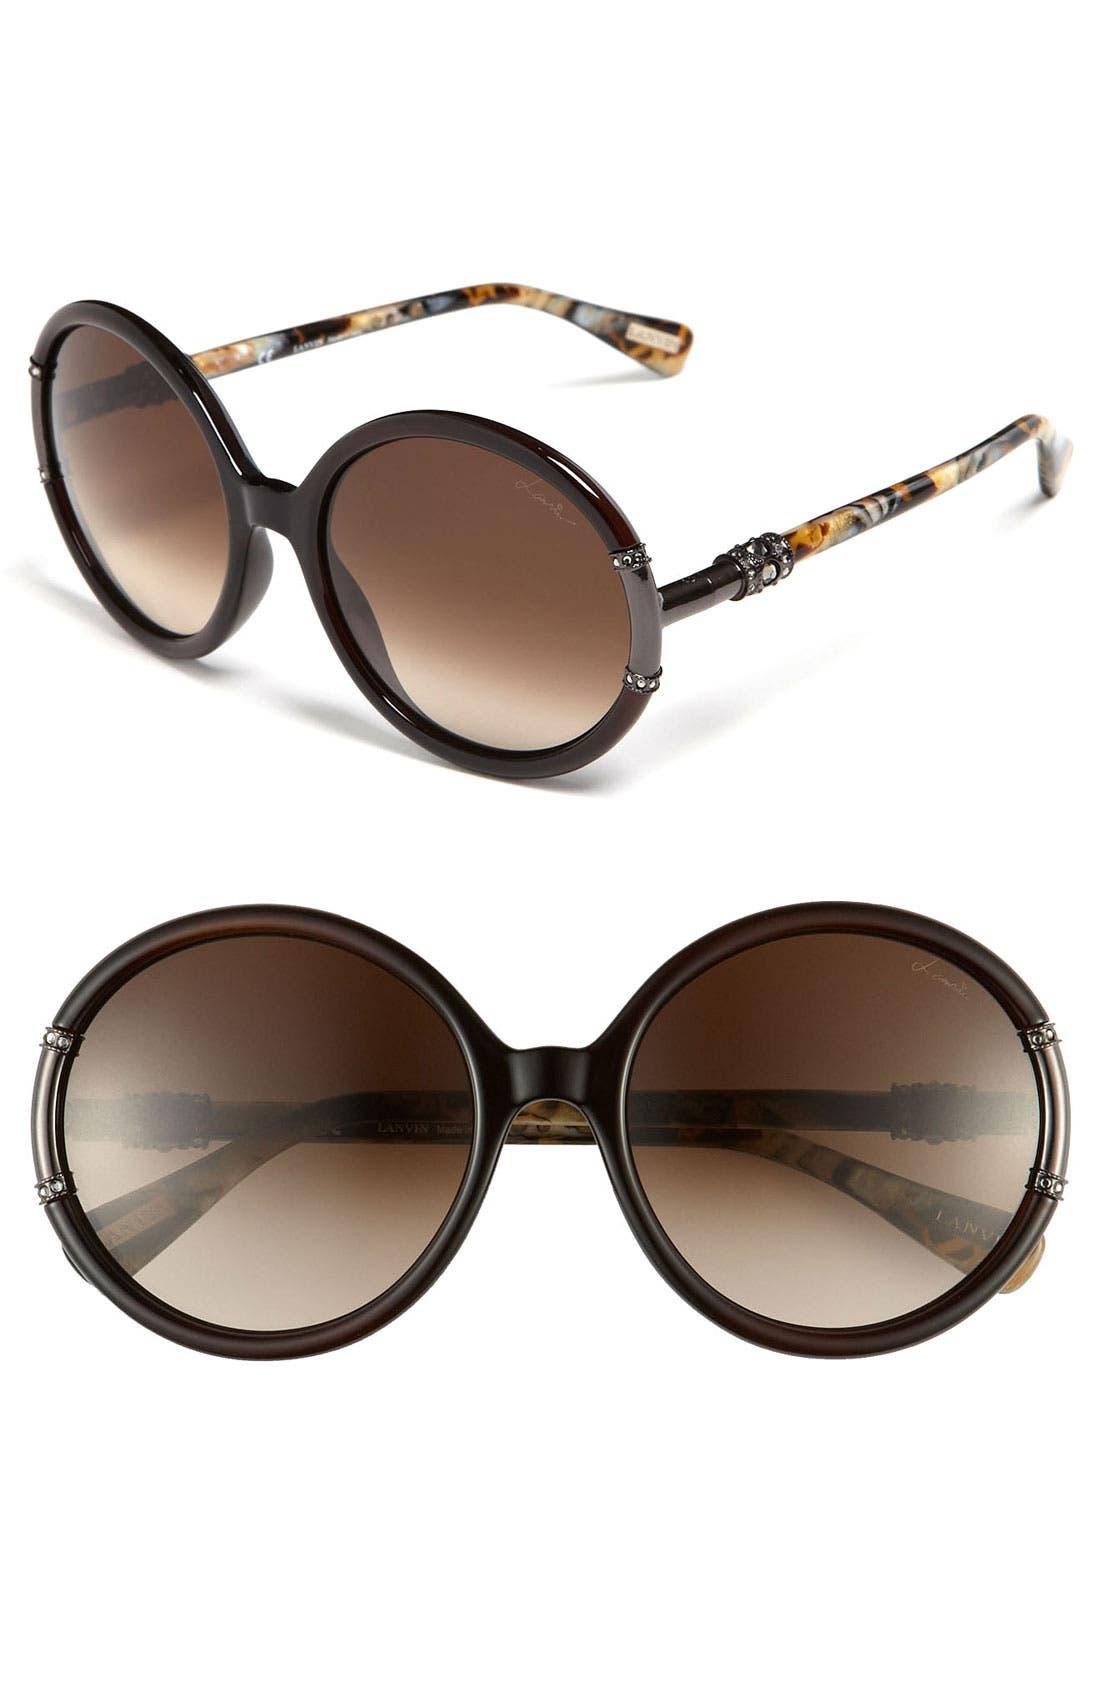 Main Image - Lanvin Round Swarovski Crystal Sunglasses